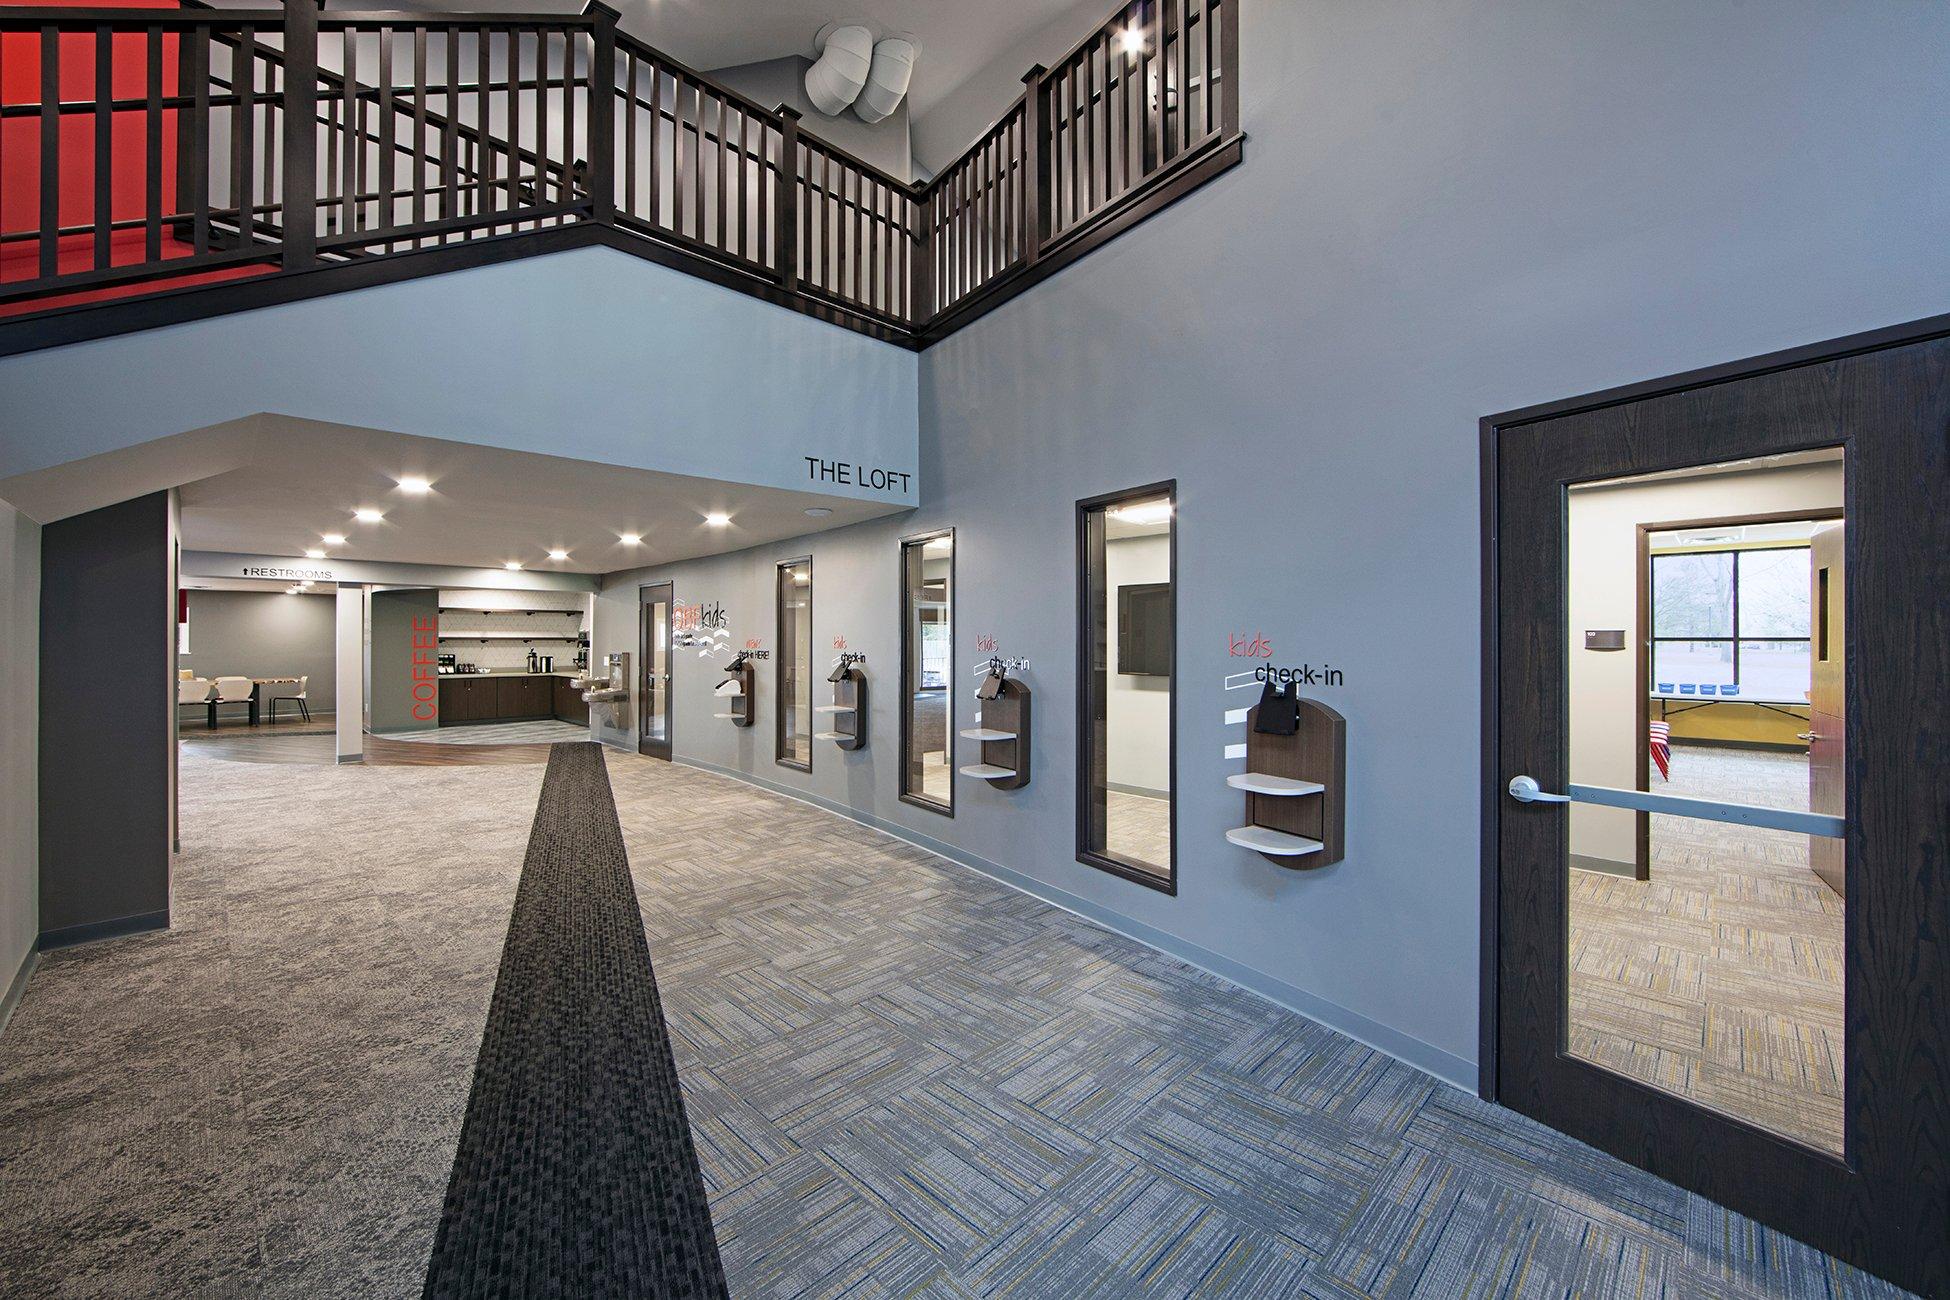 oxford-bible-kids-checkin-hallway